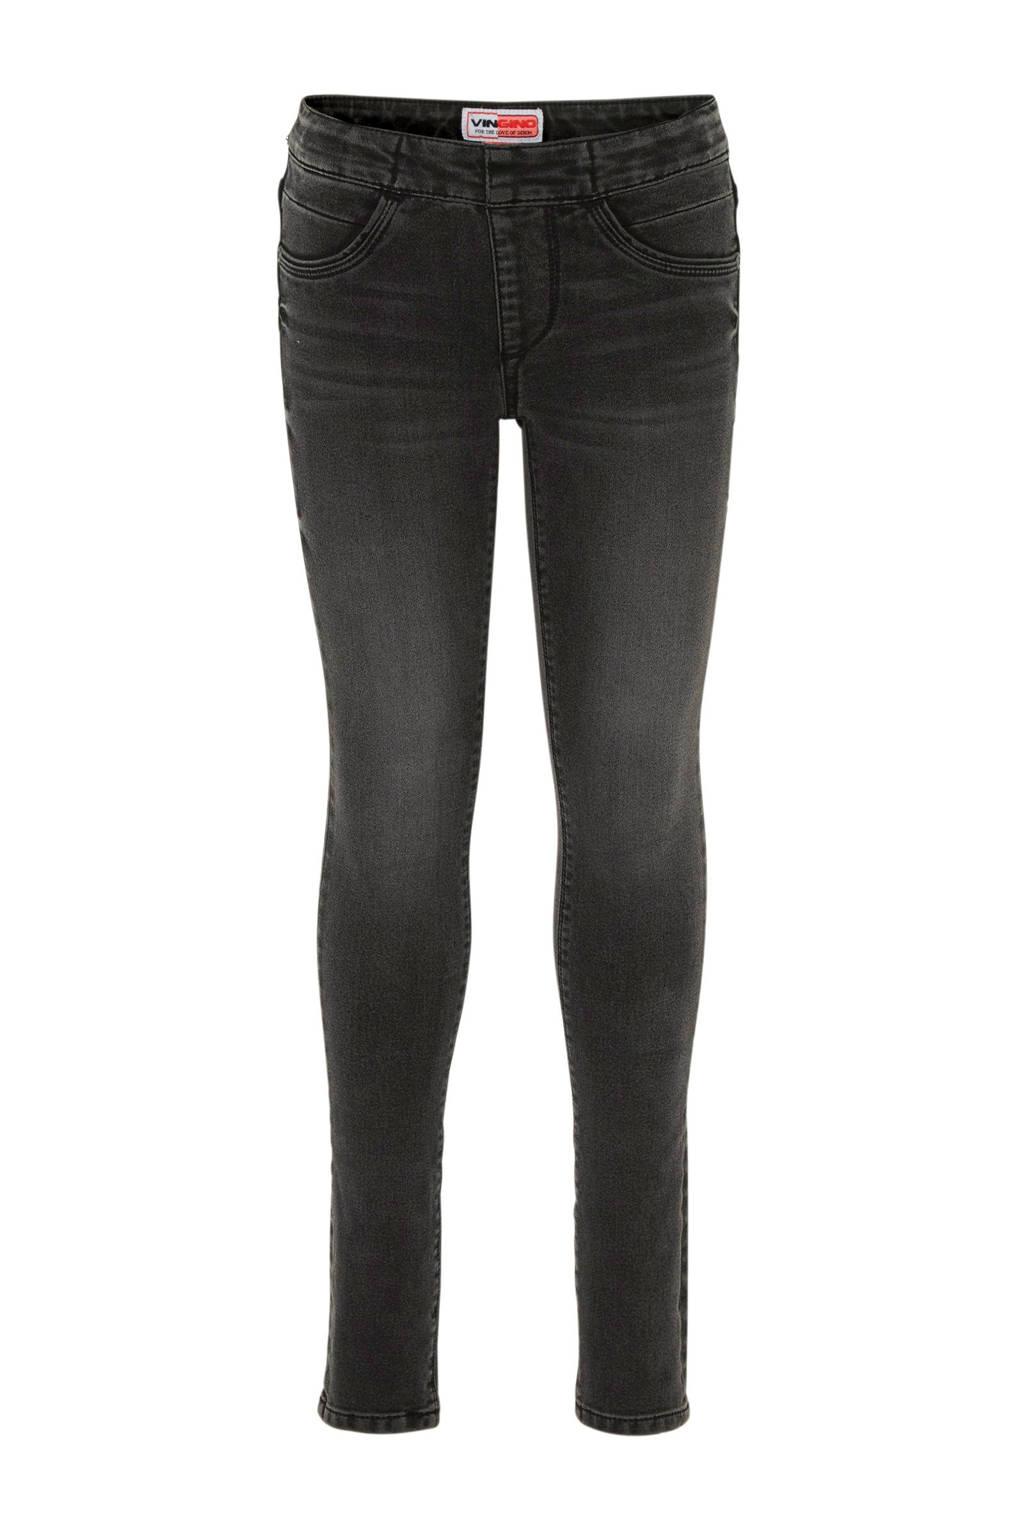 Vingino skinny jeans Biriba antraciet, Antraciet